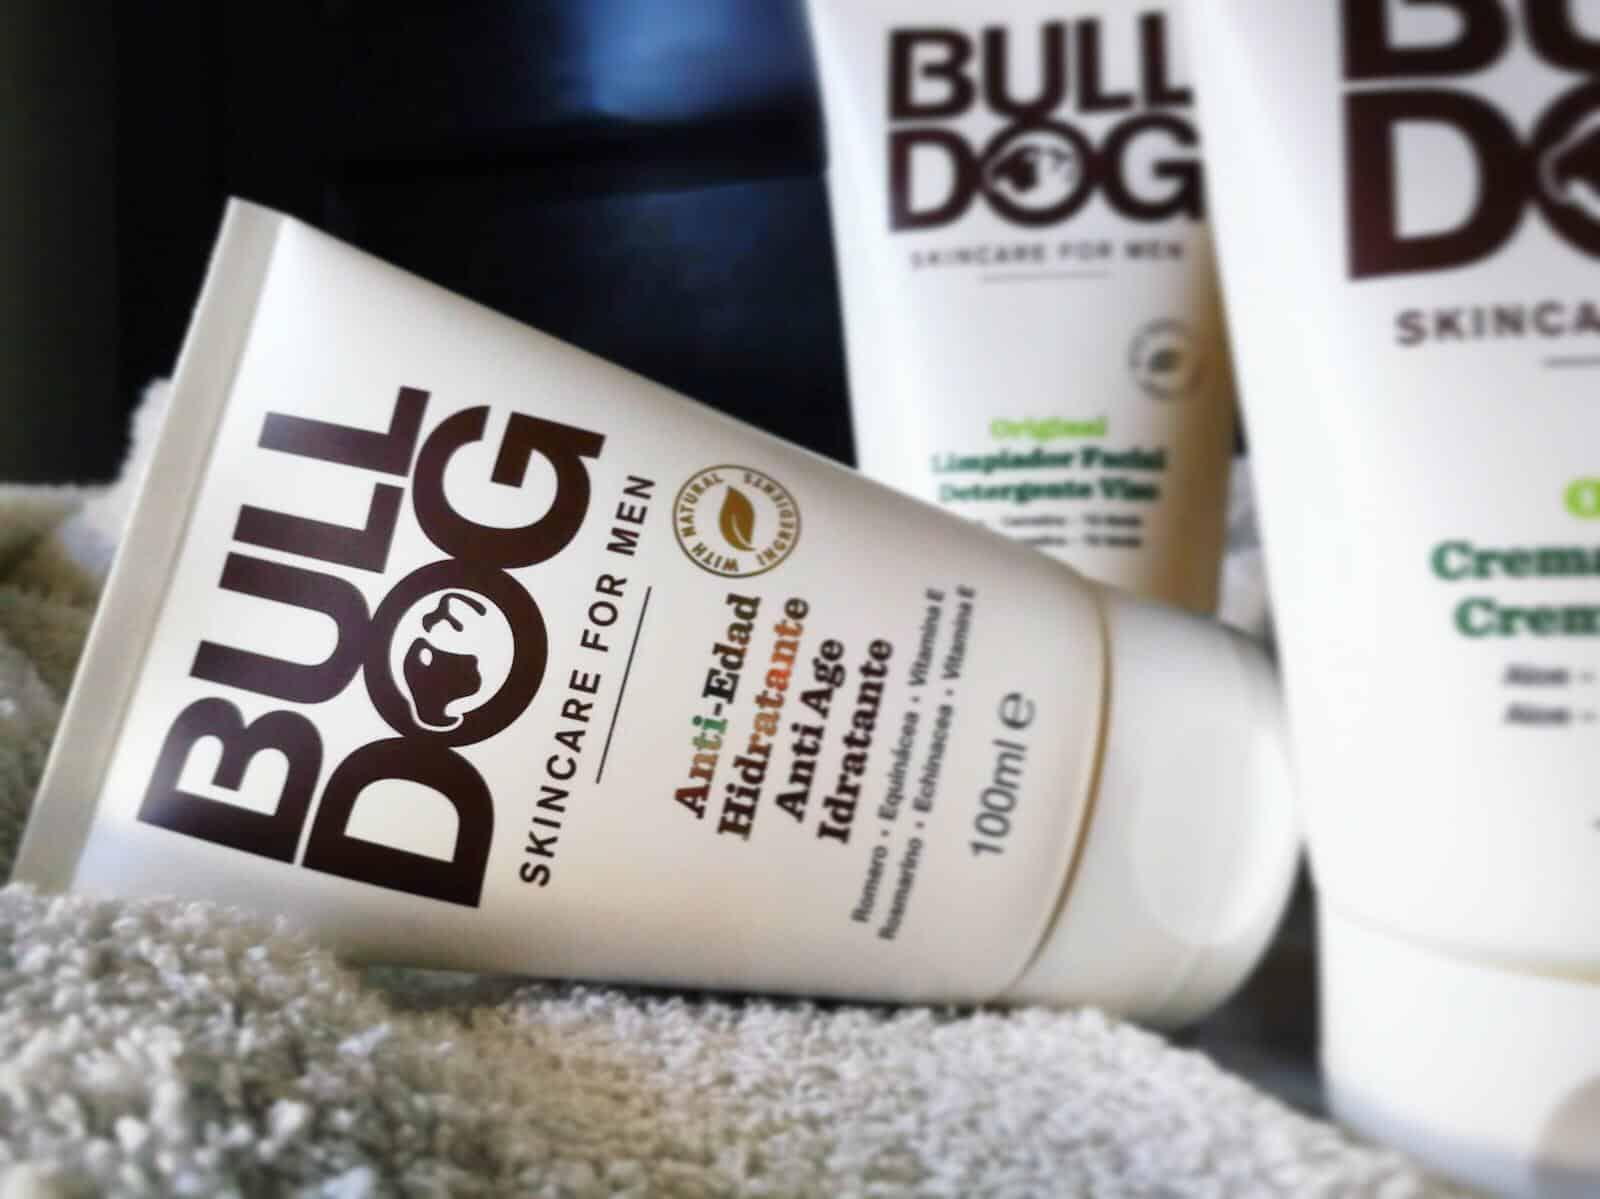 prodotti pelle viso uomo bulldog